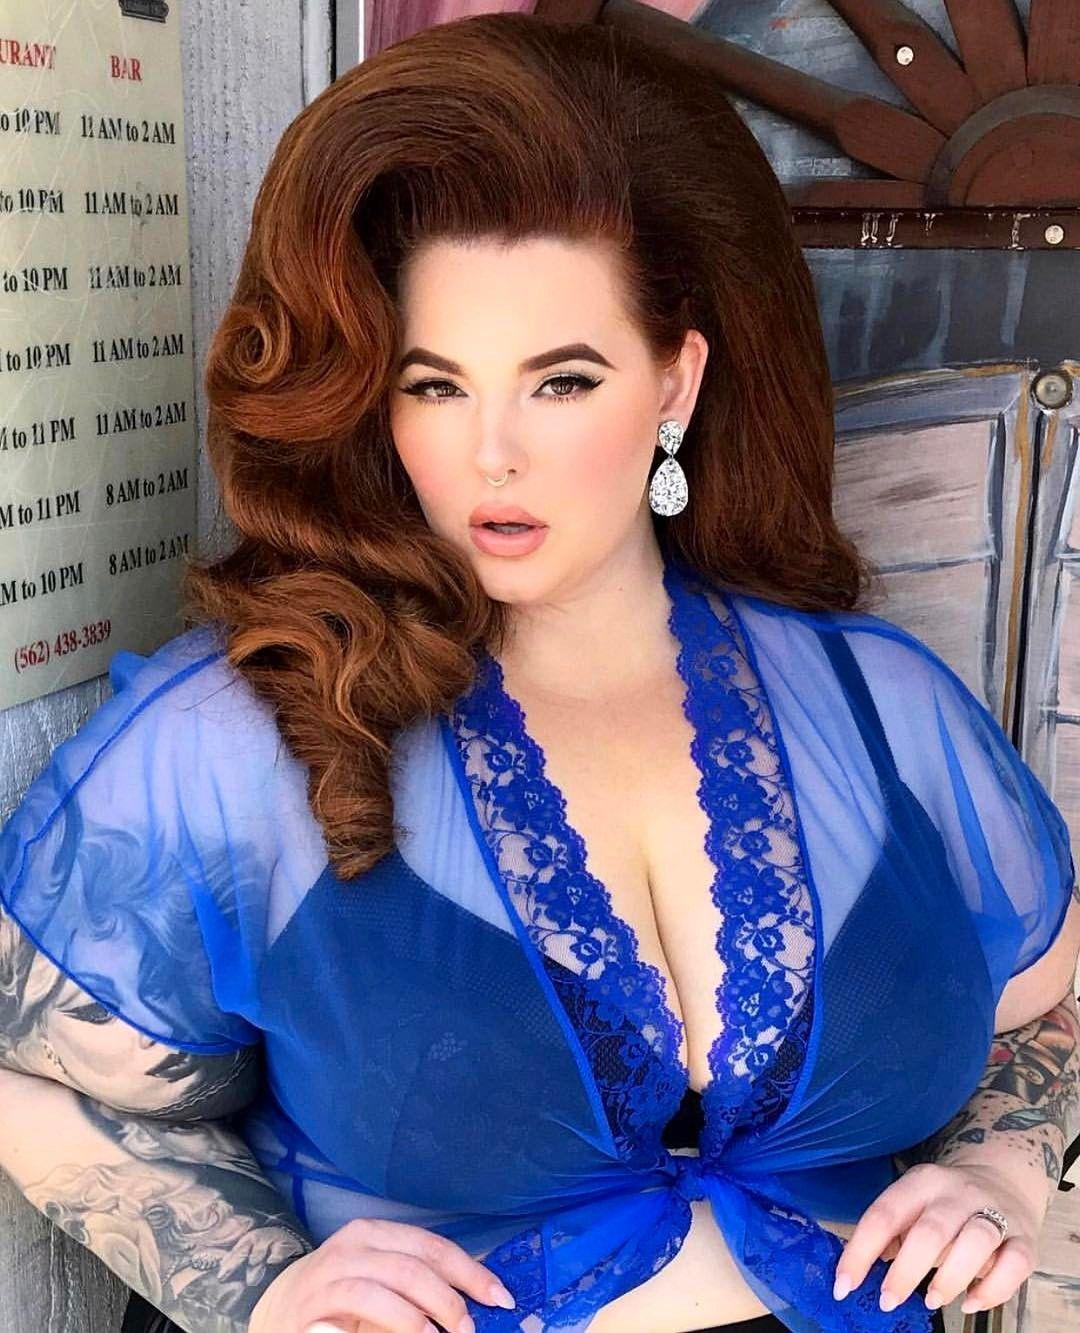 Cleavage Tess Holliday nude photos 2019